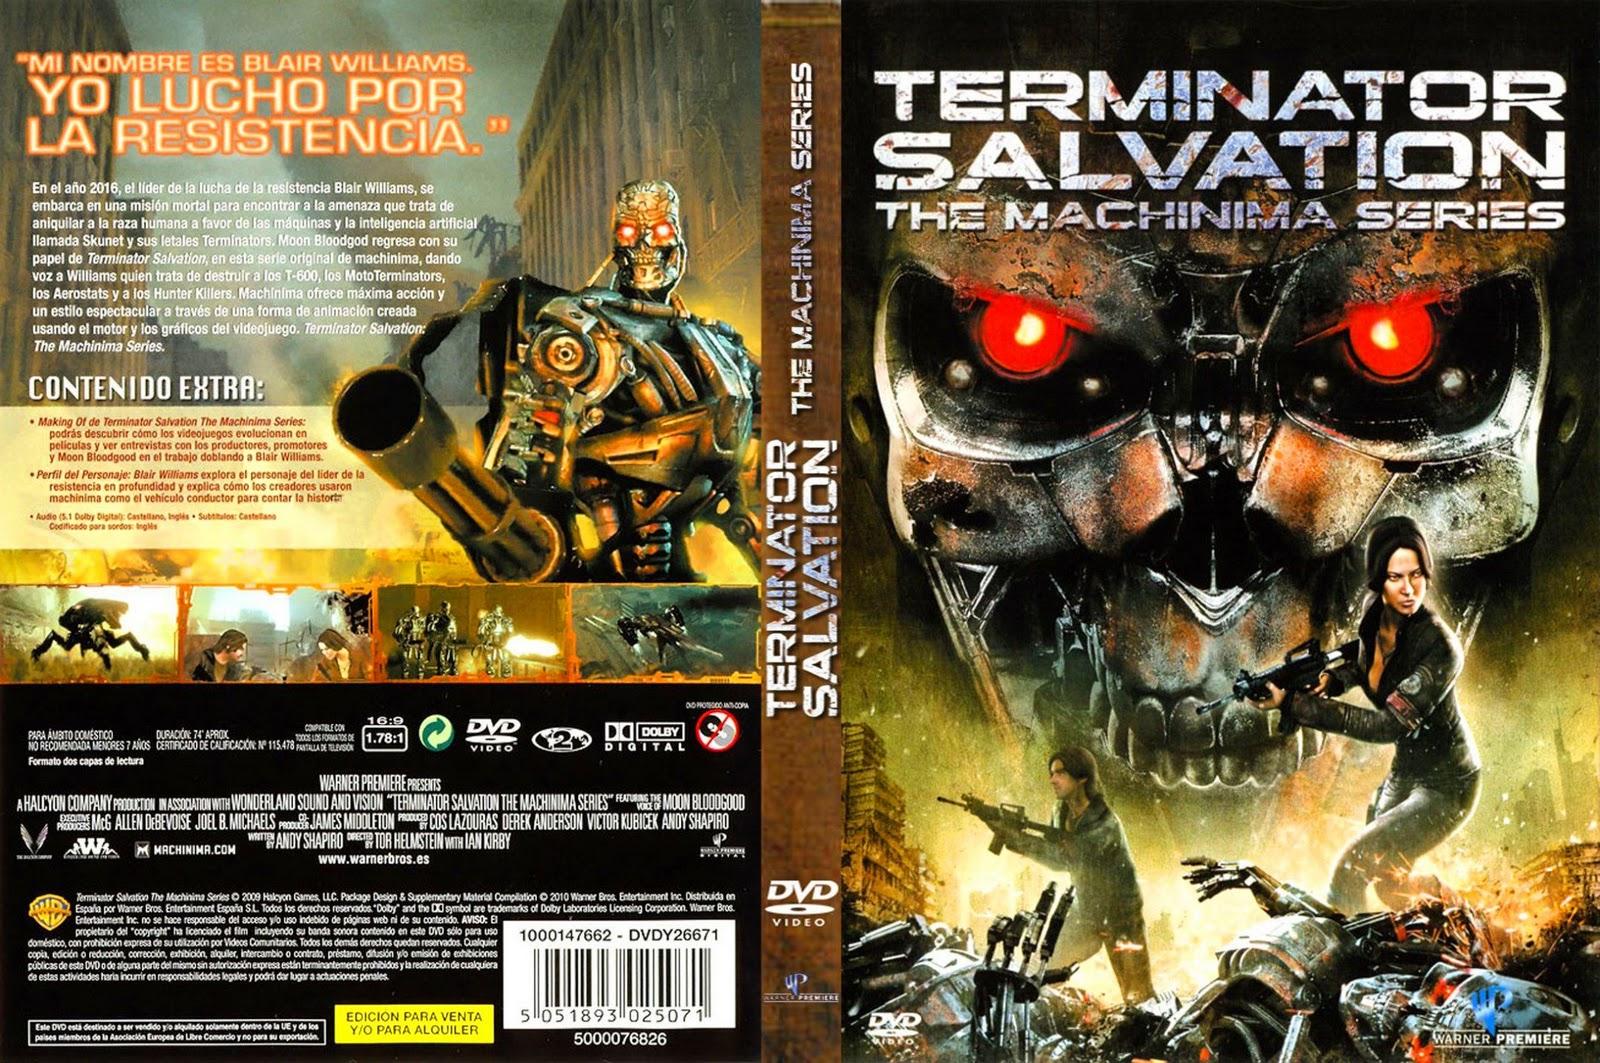 Terminator Salvtion the machinima series Terminator_Salvation_-_The_Machinima_Series+%5B%5D